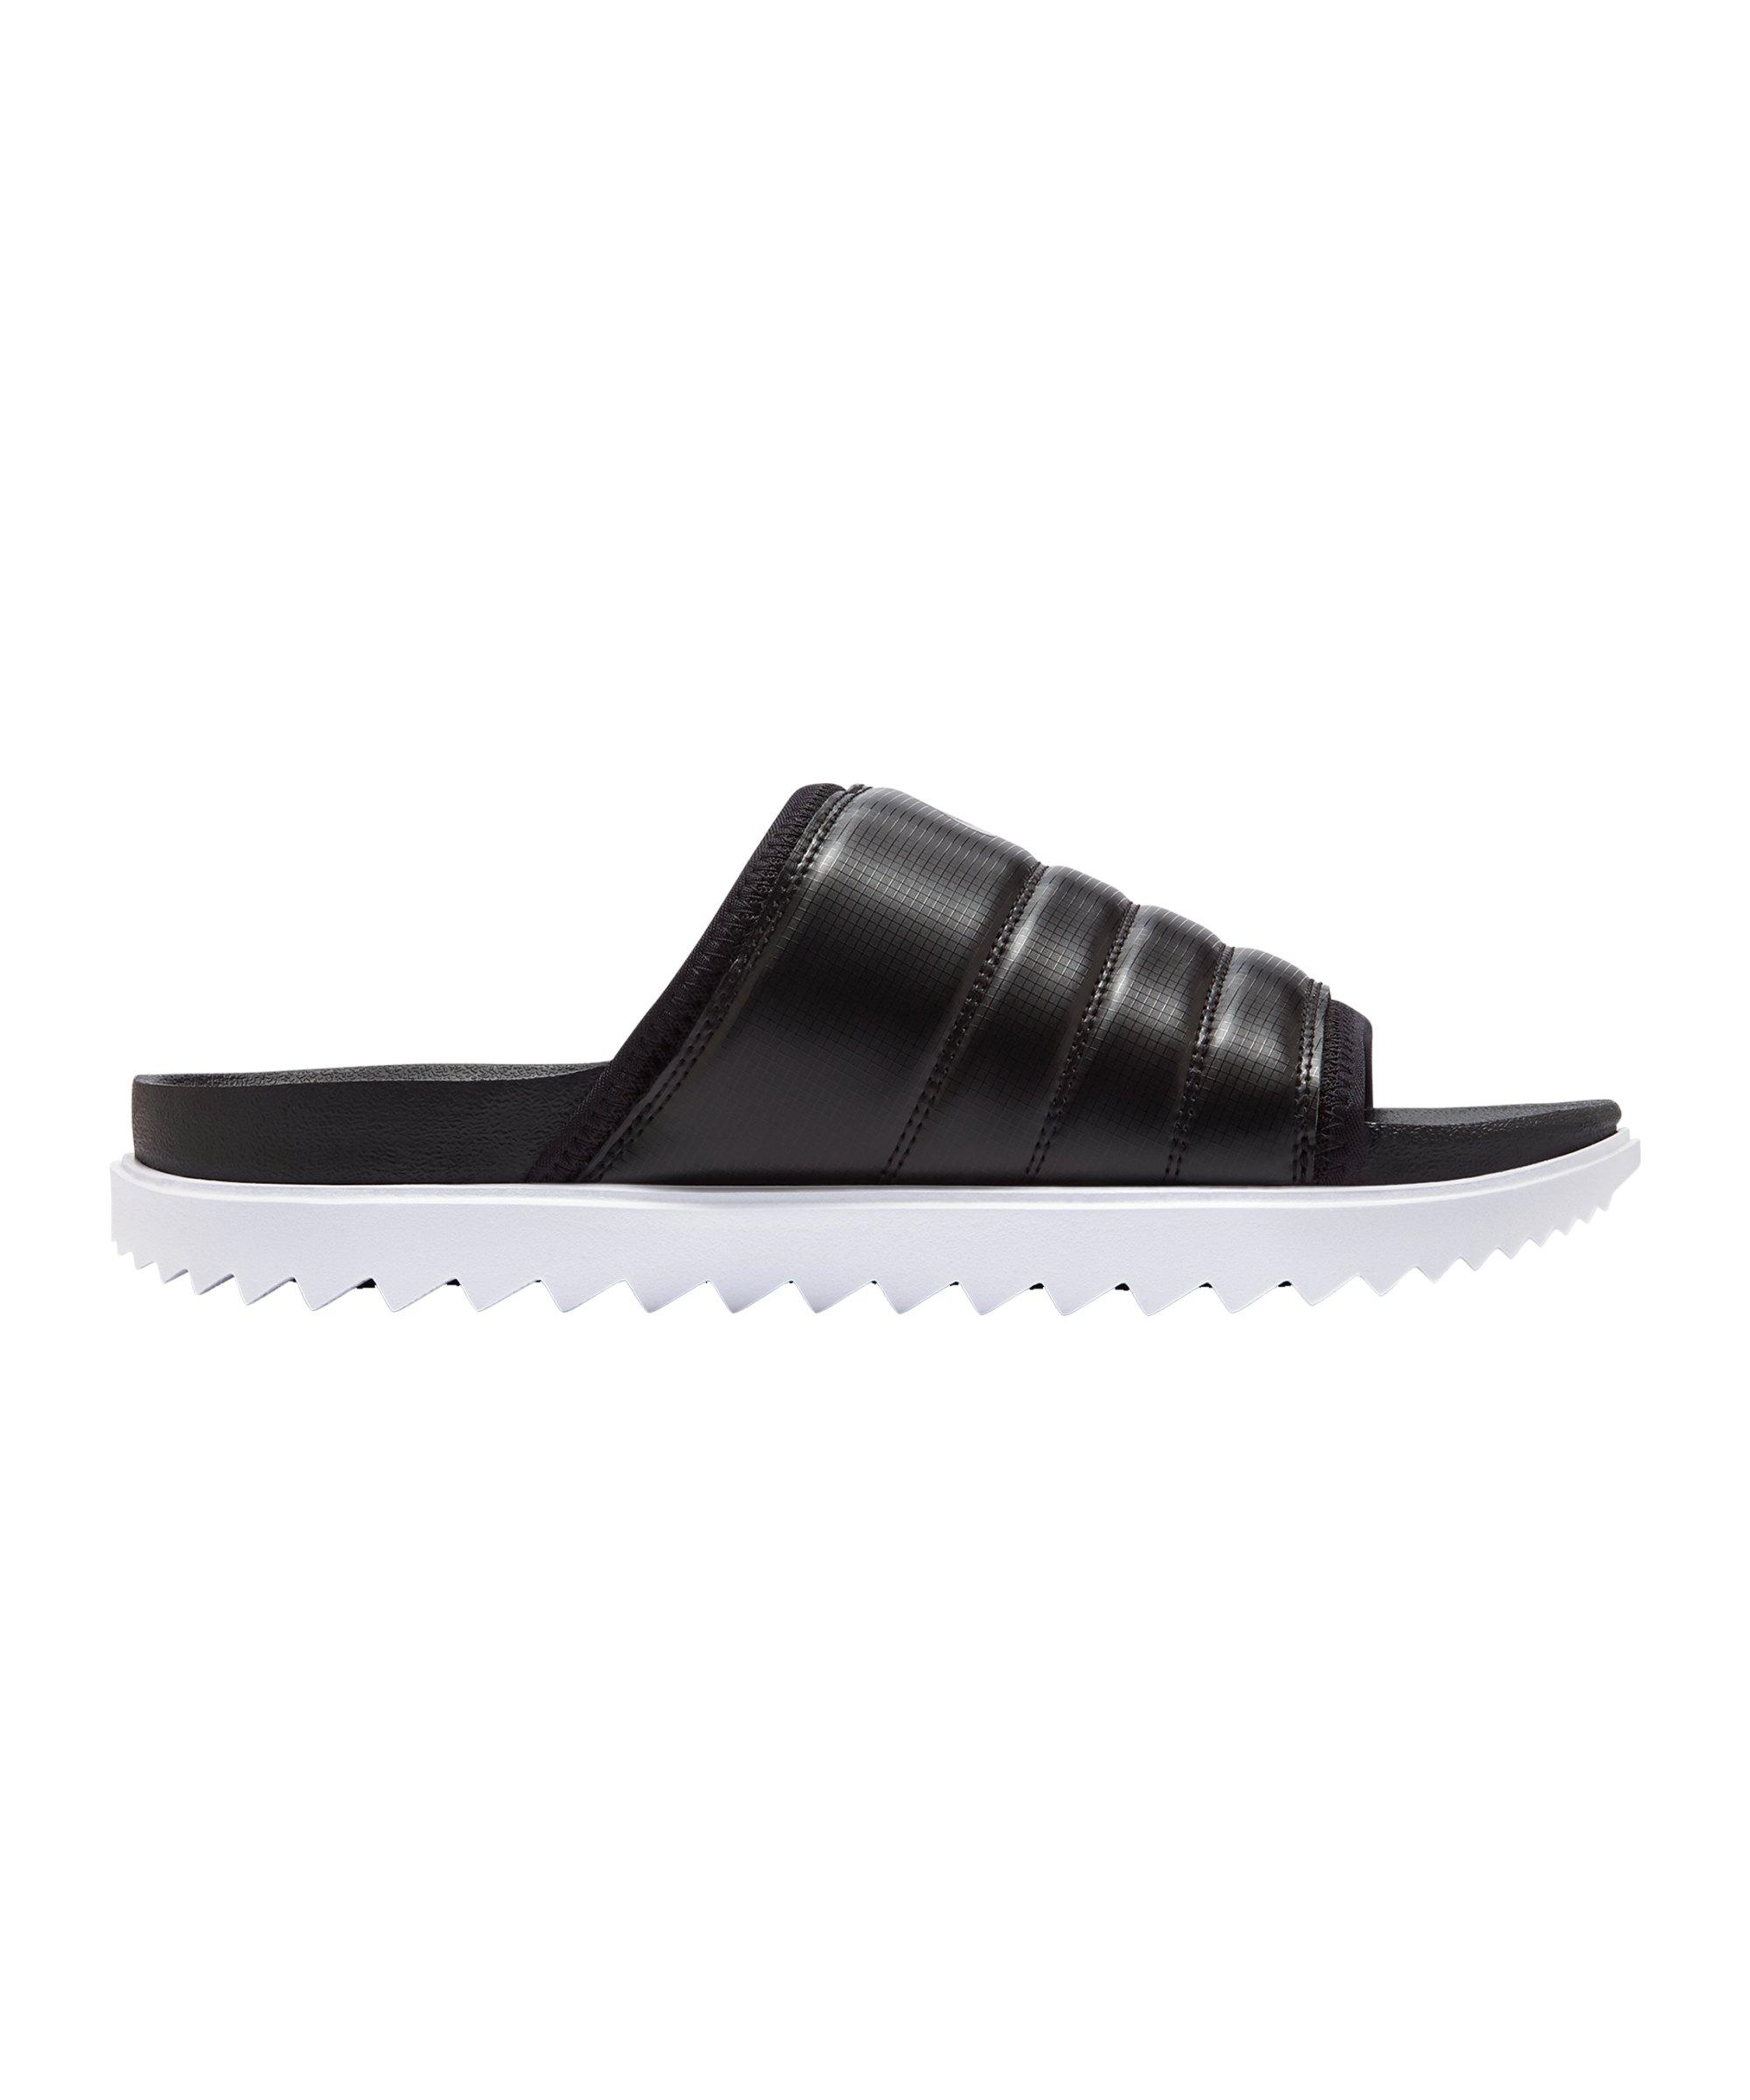 Nike Asuna Slide Badelatsche Schwarz F002 - schwarz